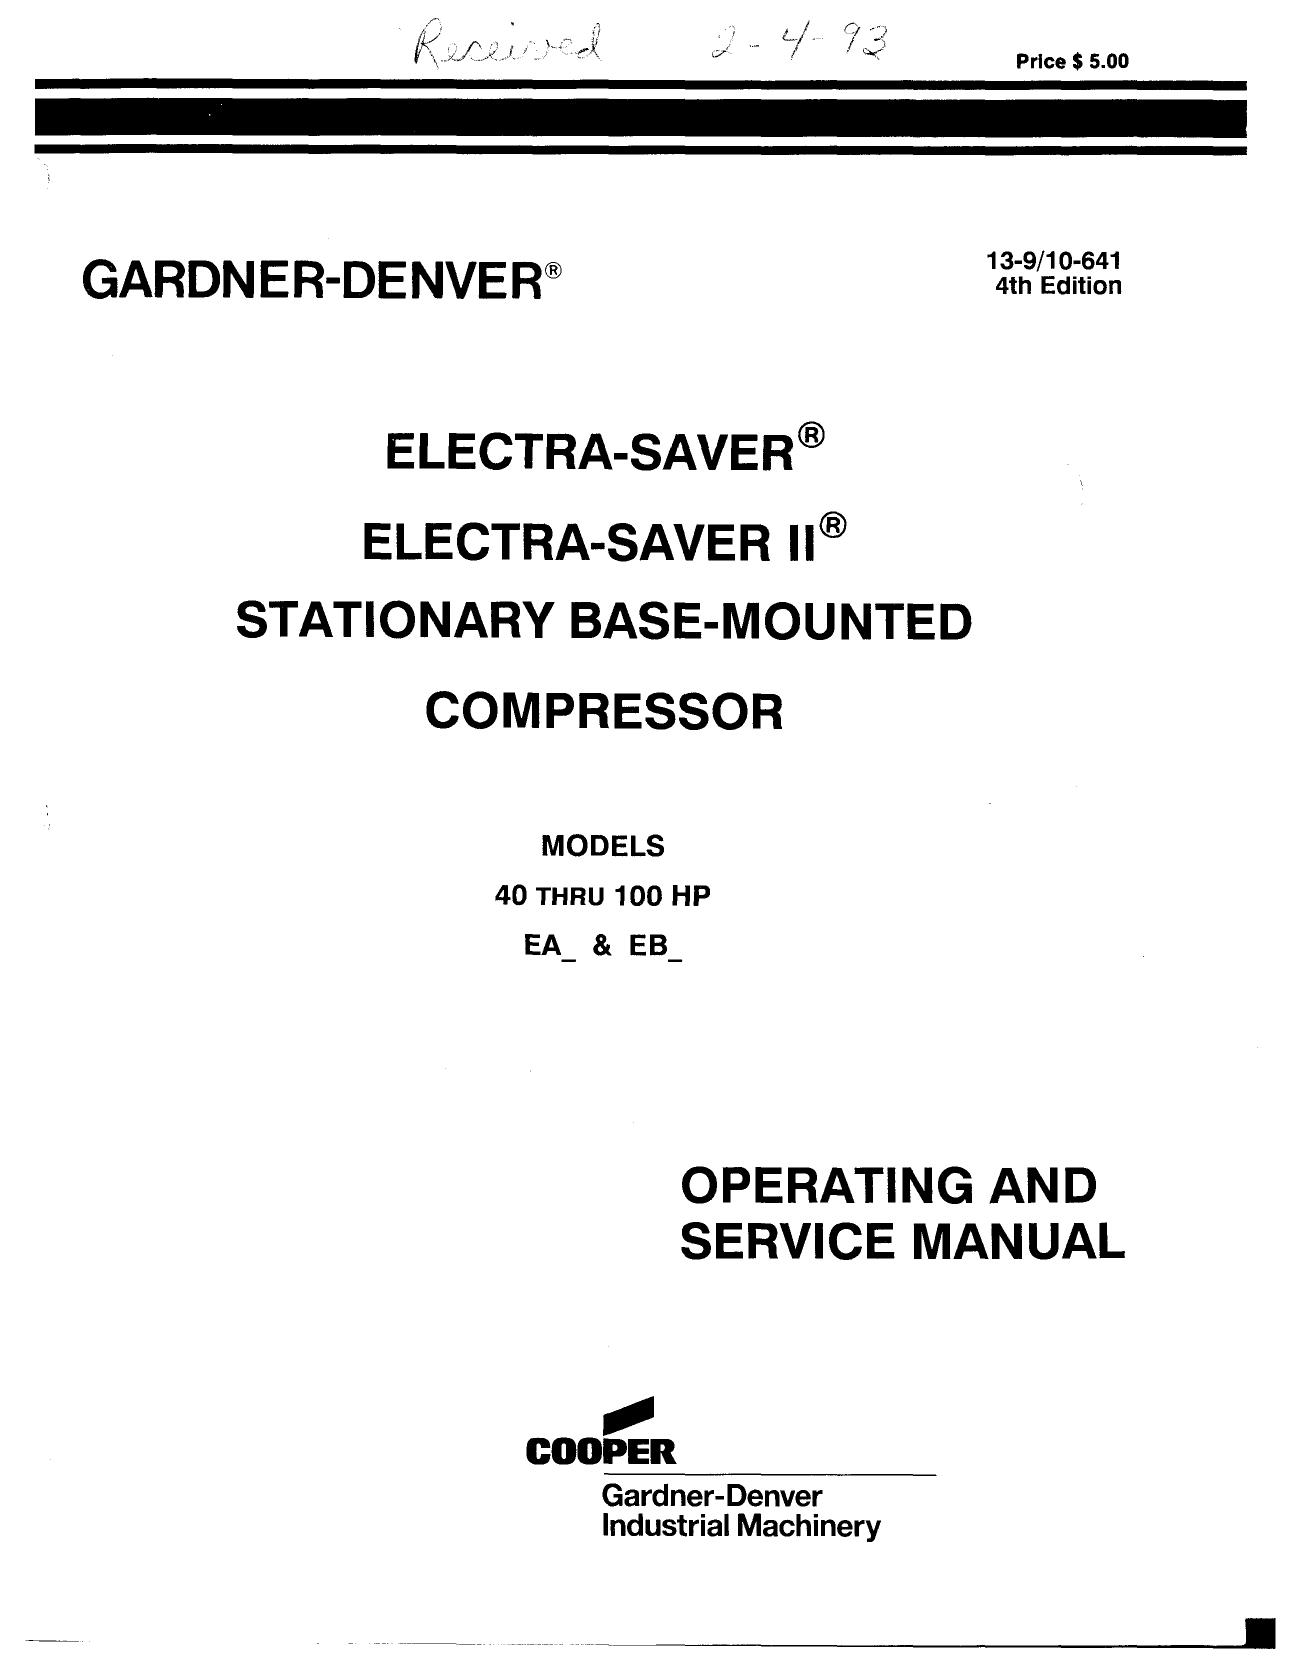 Electra Saver Ii Service manual